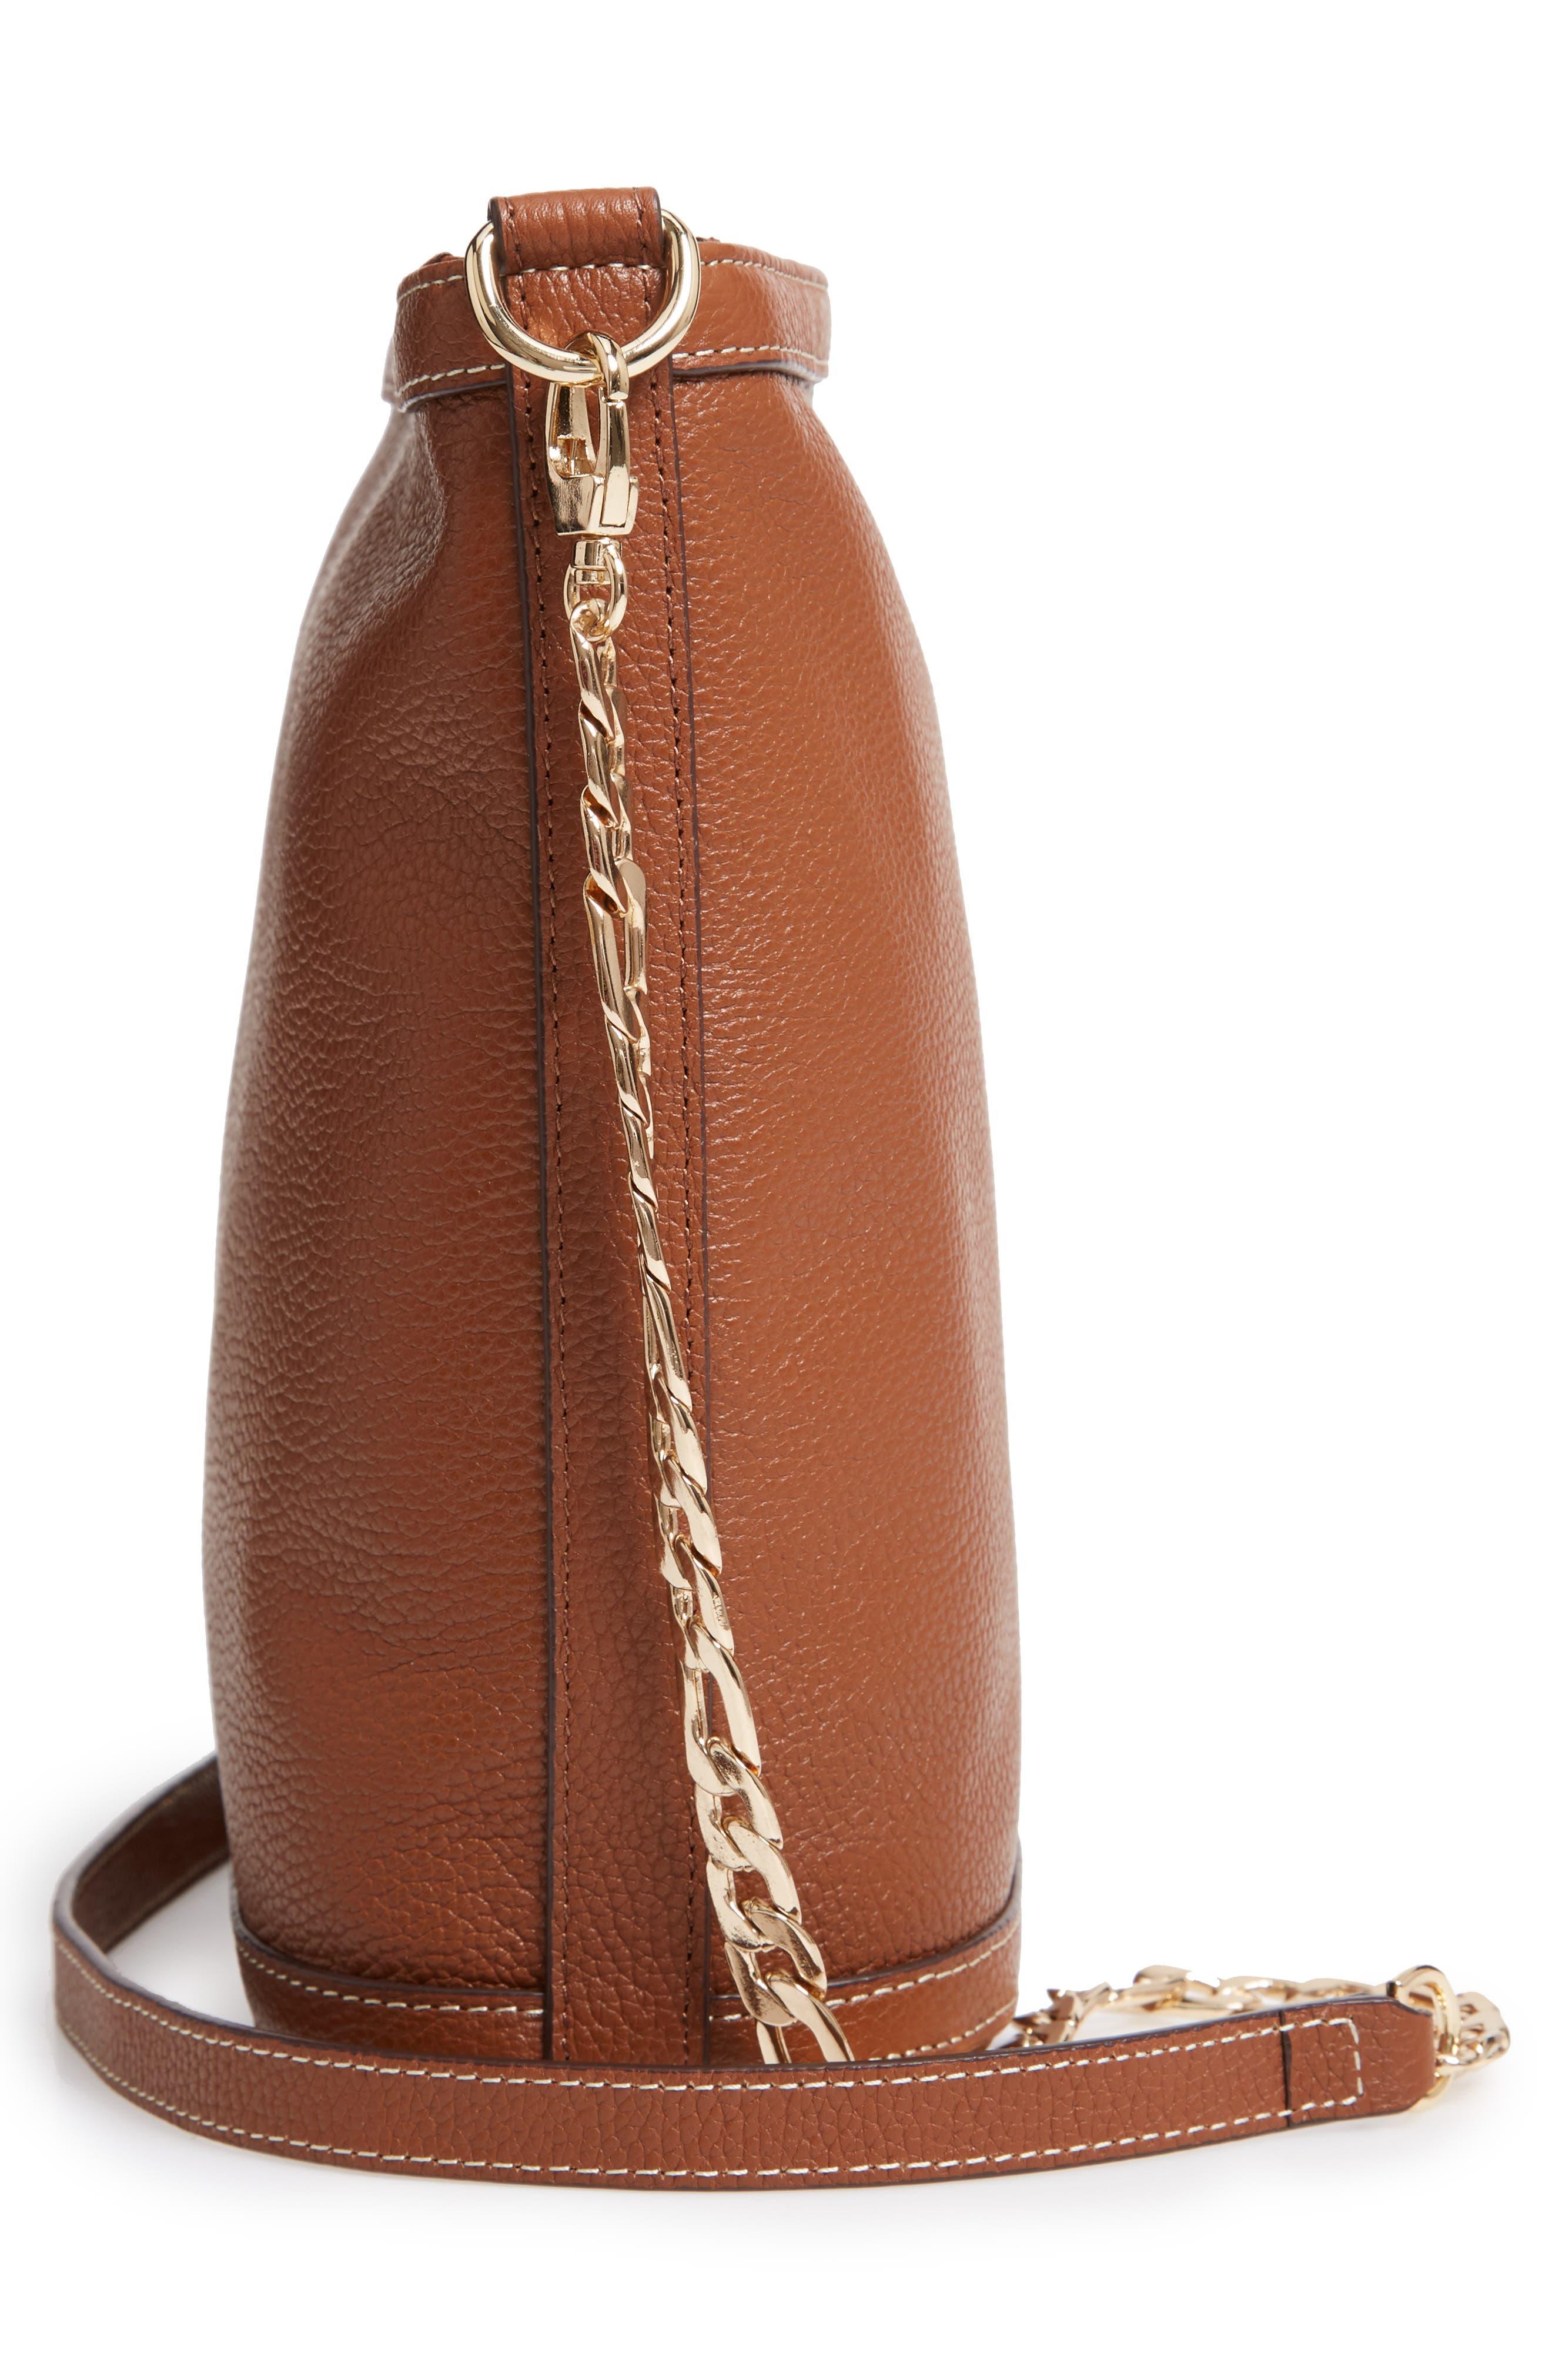 NORDSTROM,                             Maribel Leather Crossbody Bag,                             Alternate thumbnail 5, color,                             BROWN AZTEC